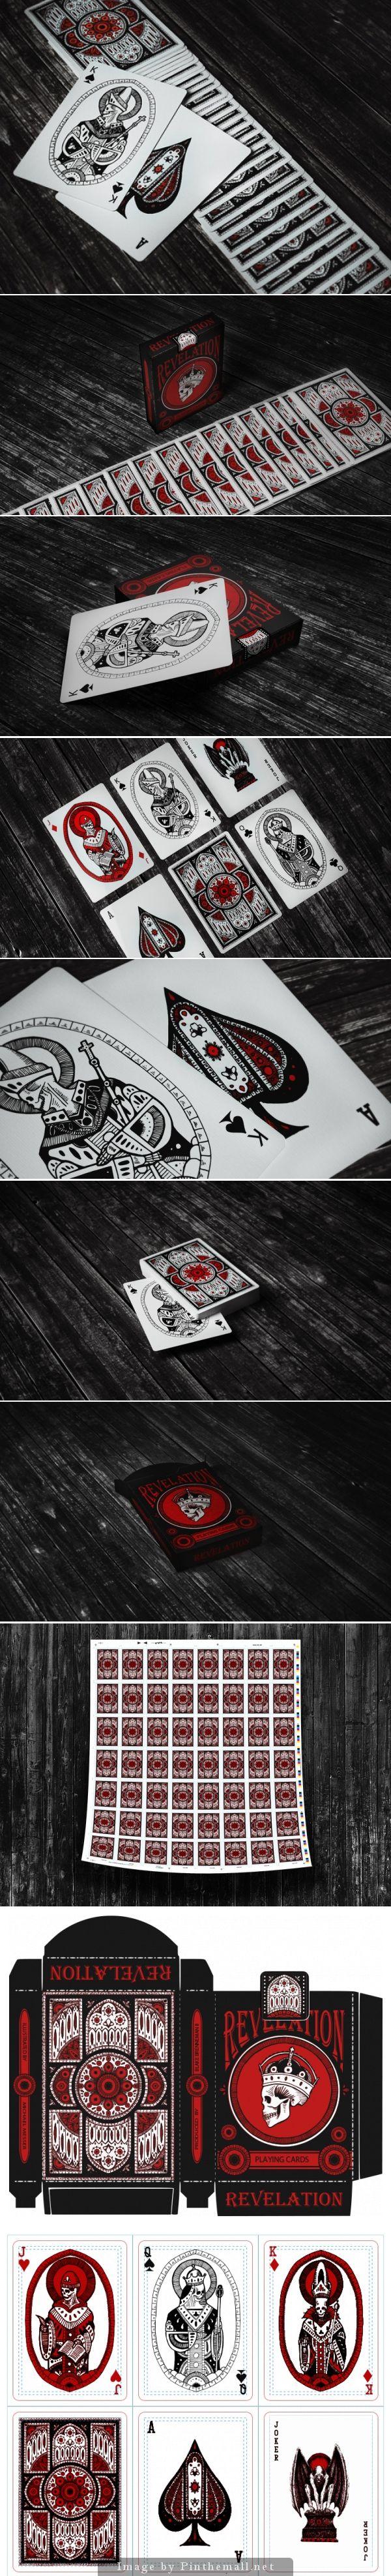 68b3968d483ac32bd9f35898469225bb  trump card cartomancy Top Result 50 Fresh Fire Pit Poker Photos 2018 Kse4